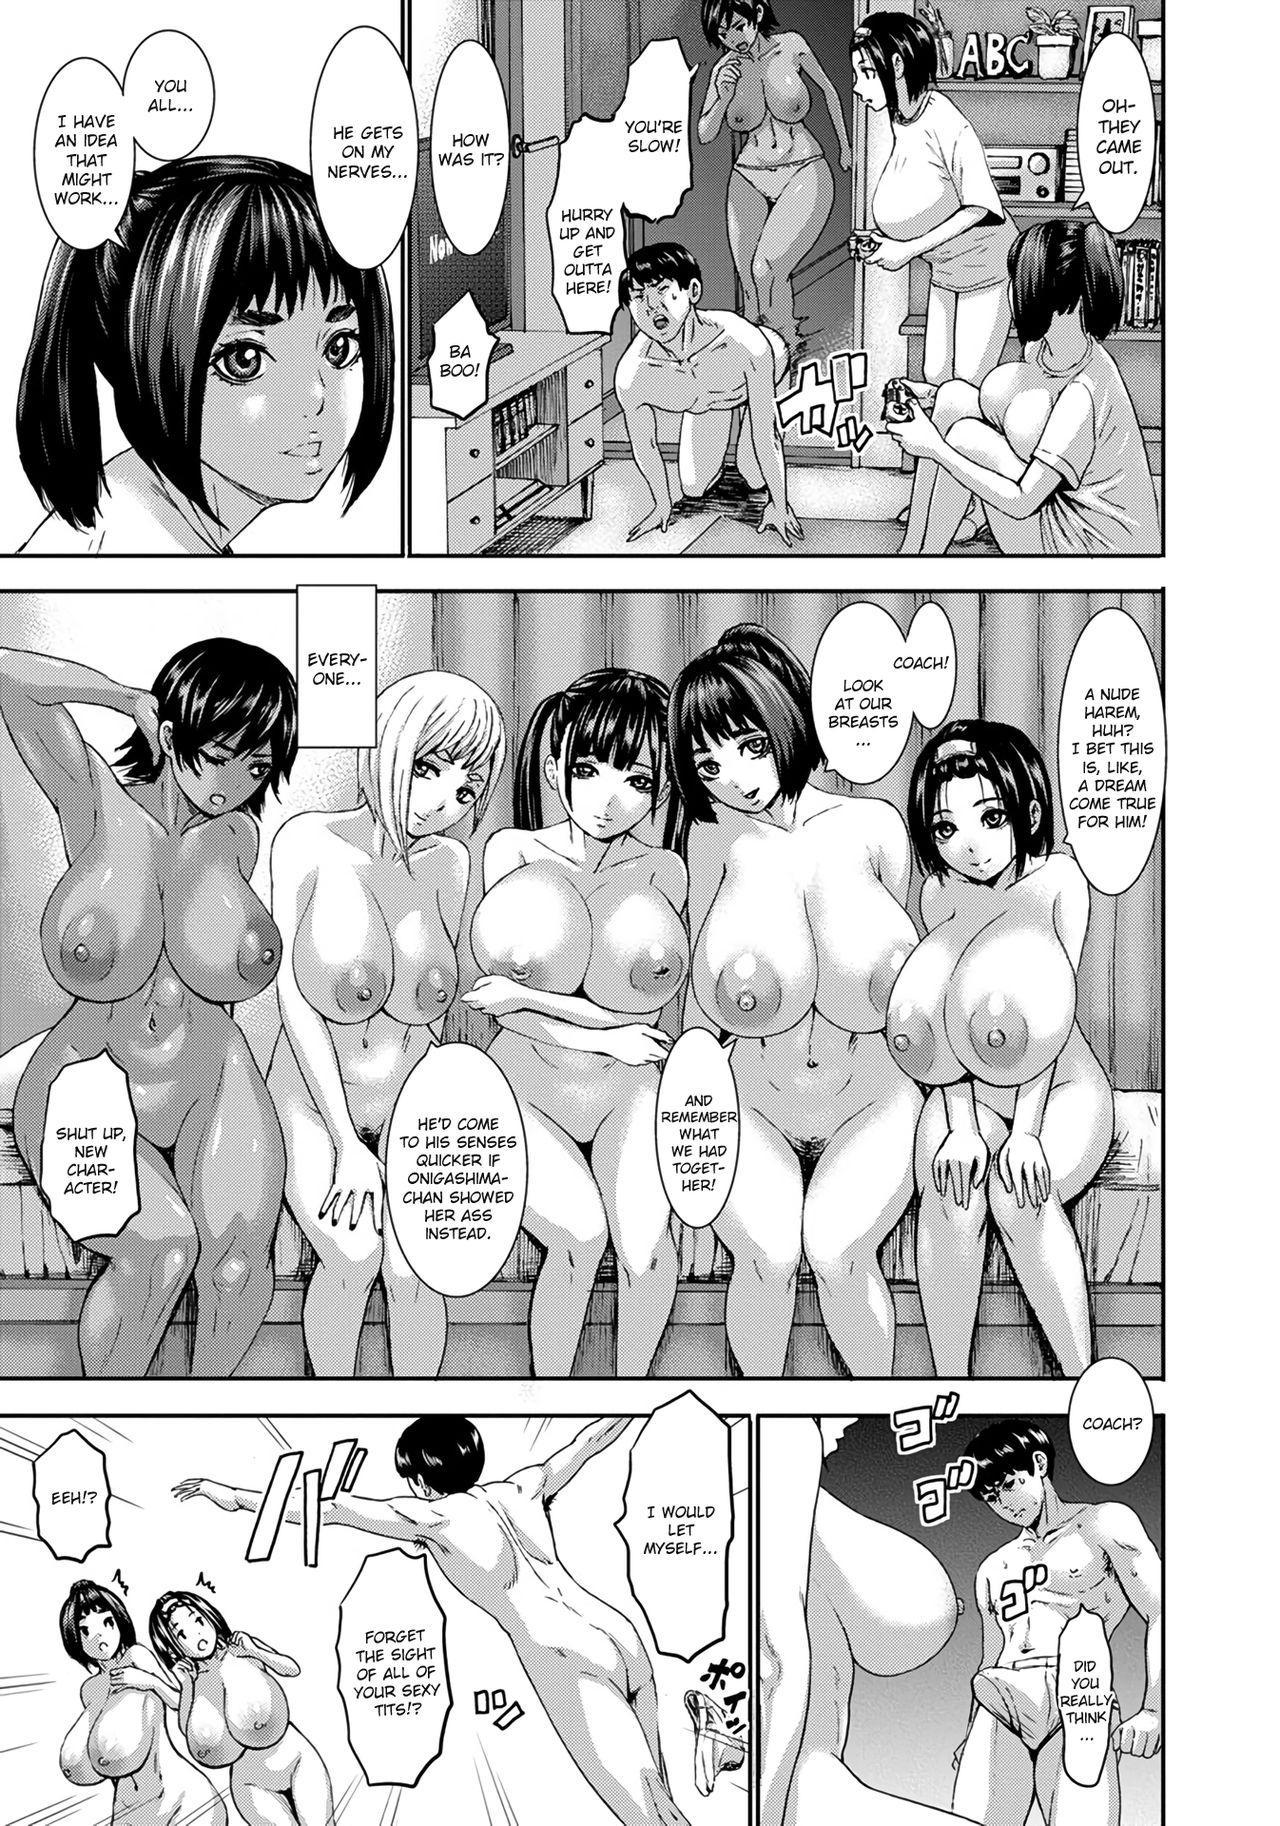 Chounyuu Gakuen | Academy For Huge Breasts 170